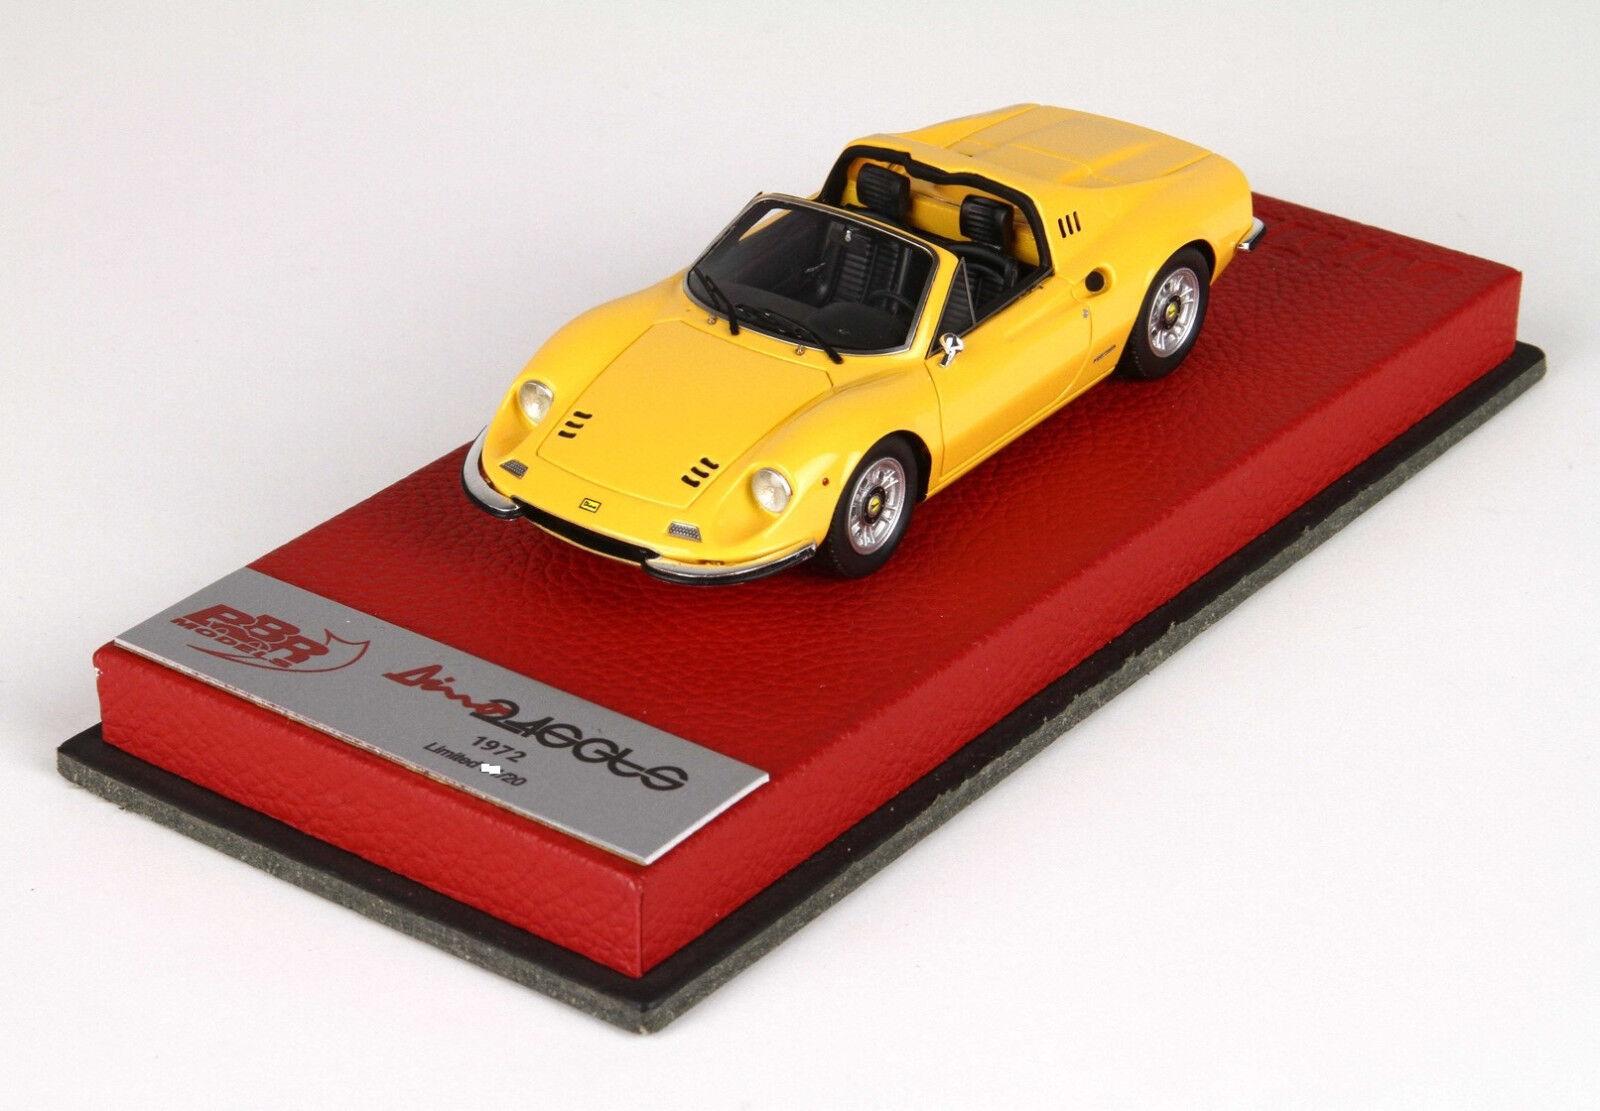 Ferrari Ferrari Ferrari Dino 246 GTS 1972 yellow Modena 1 43 lim.ed.20pcs BBRC54BPRE BBR a15715